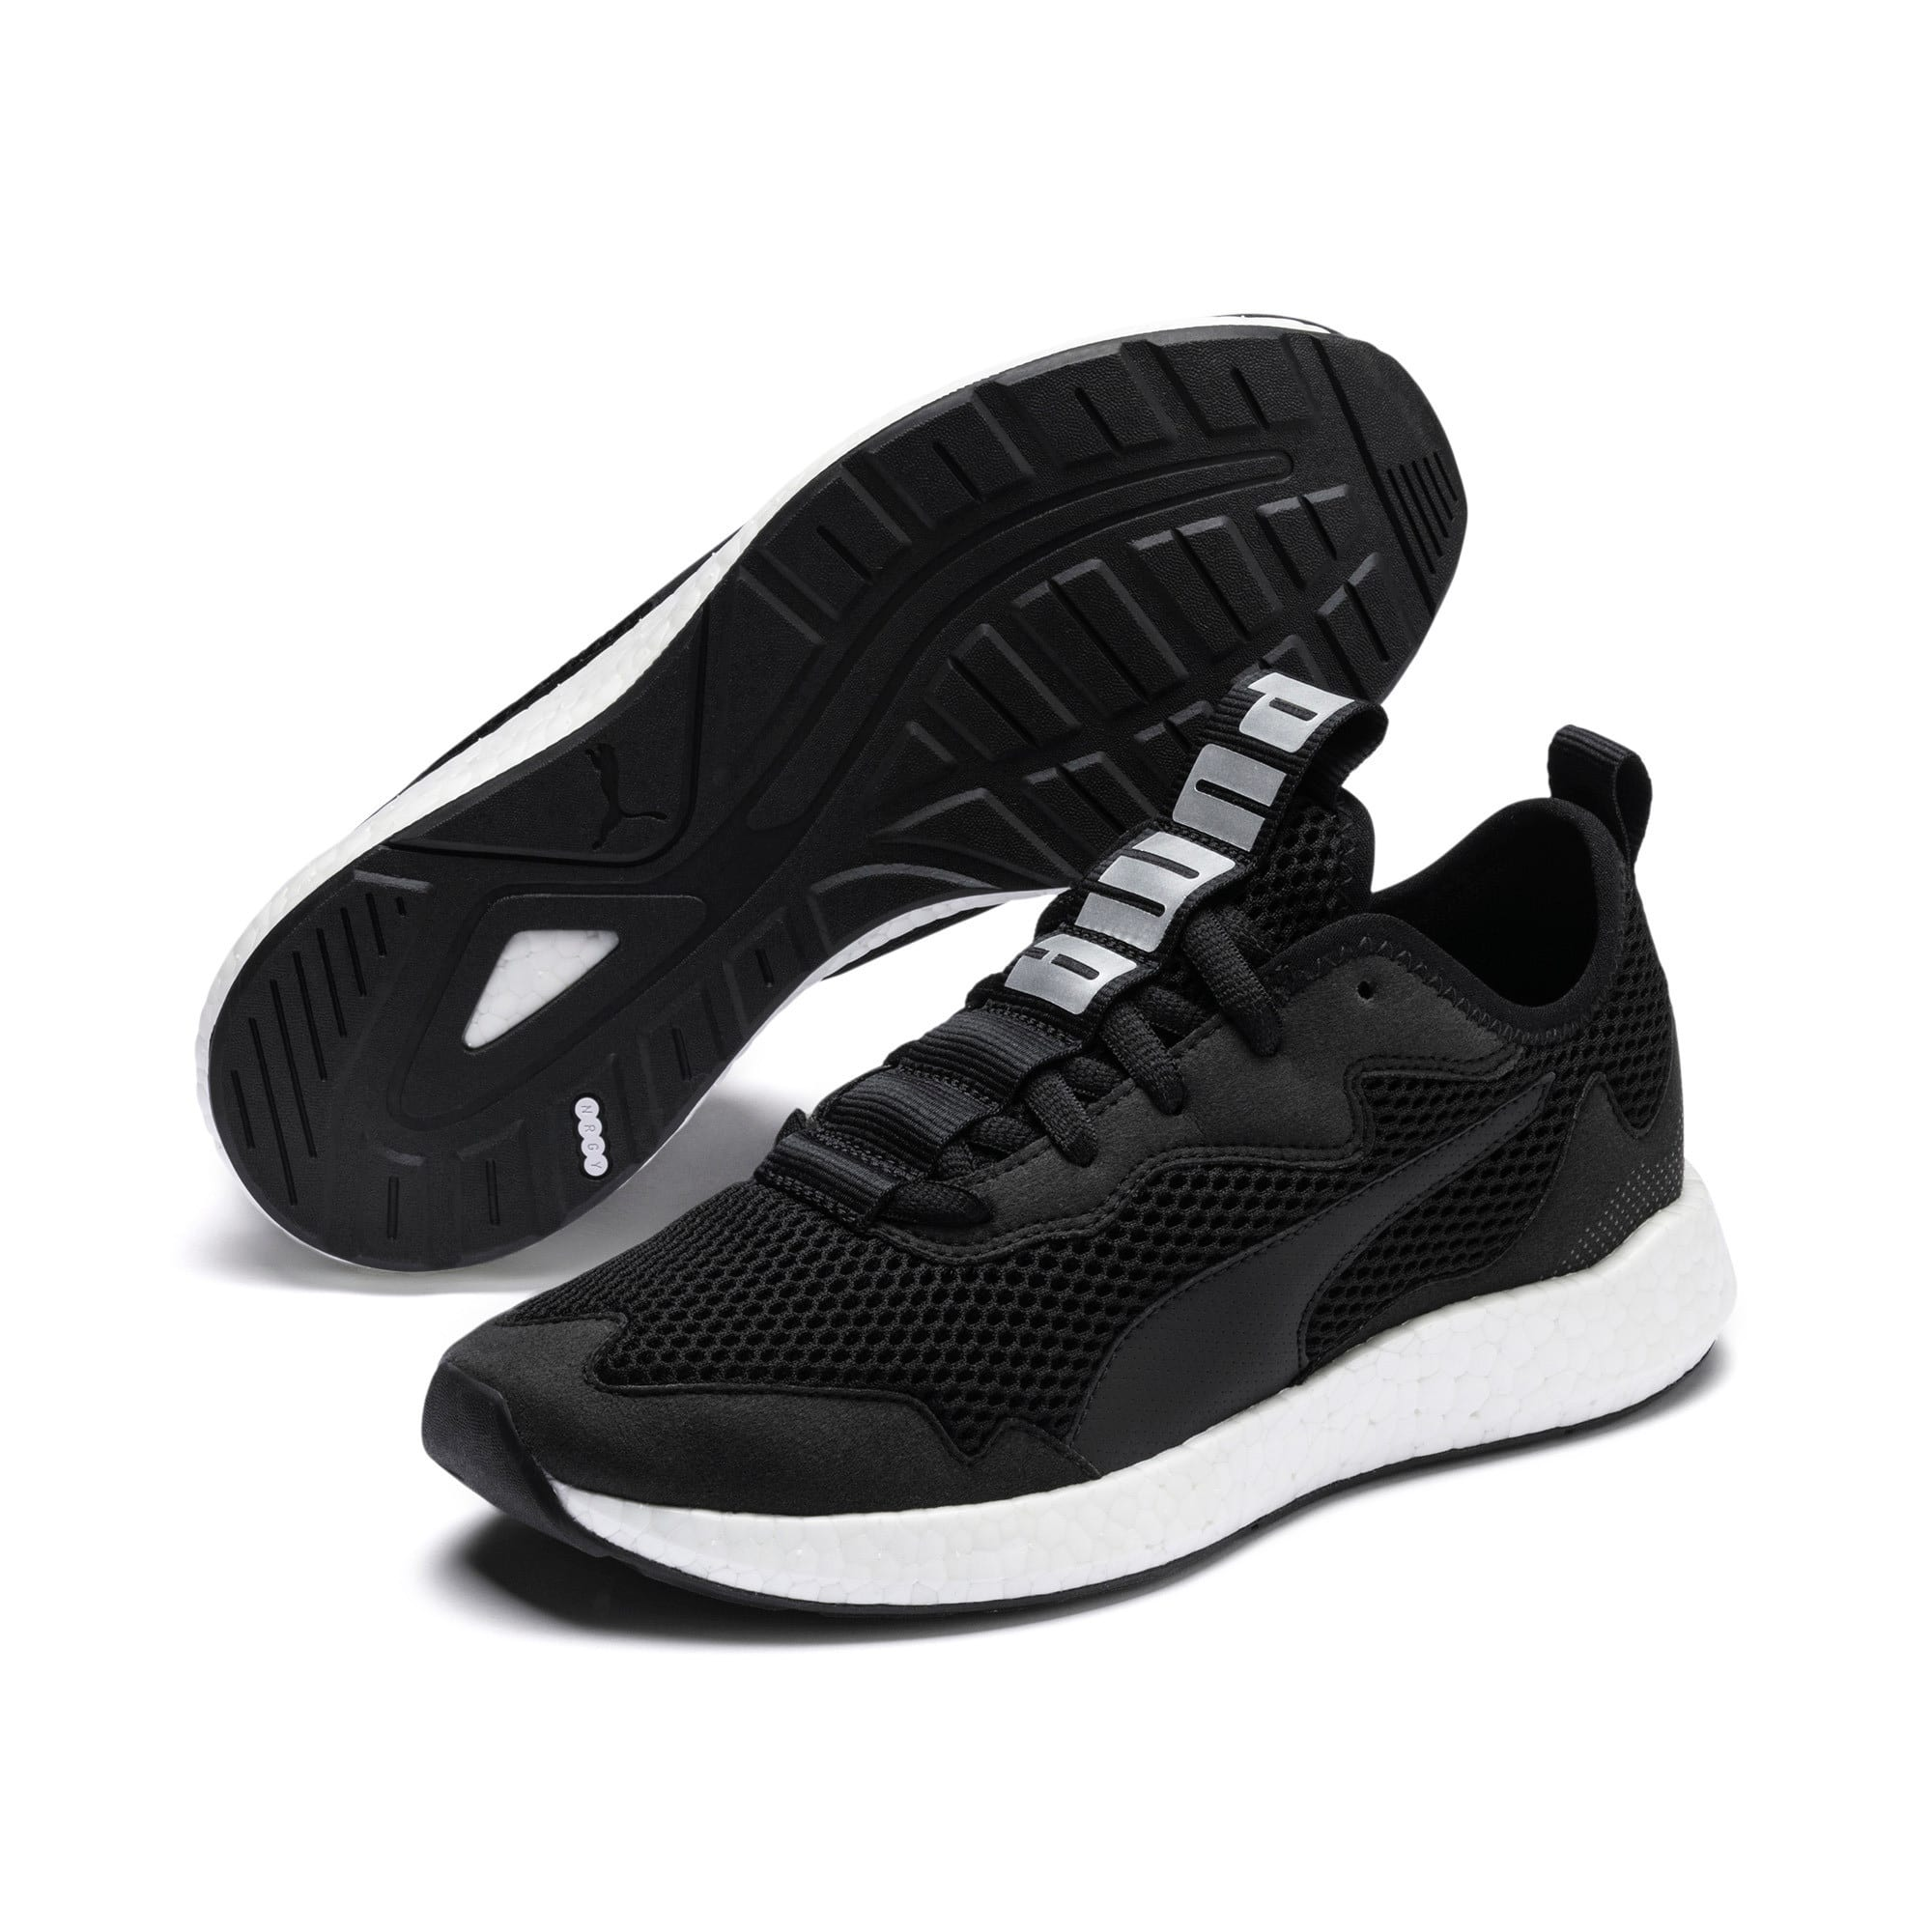 Thumbnail 3 van NRGY Neko Skim hardloopschoenen voor vrouwen, Puma Black-Puma Silver, medium